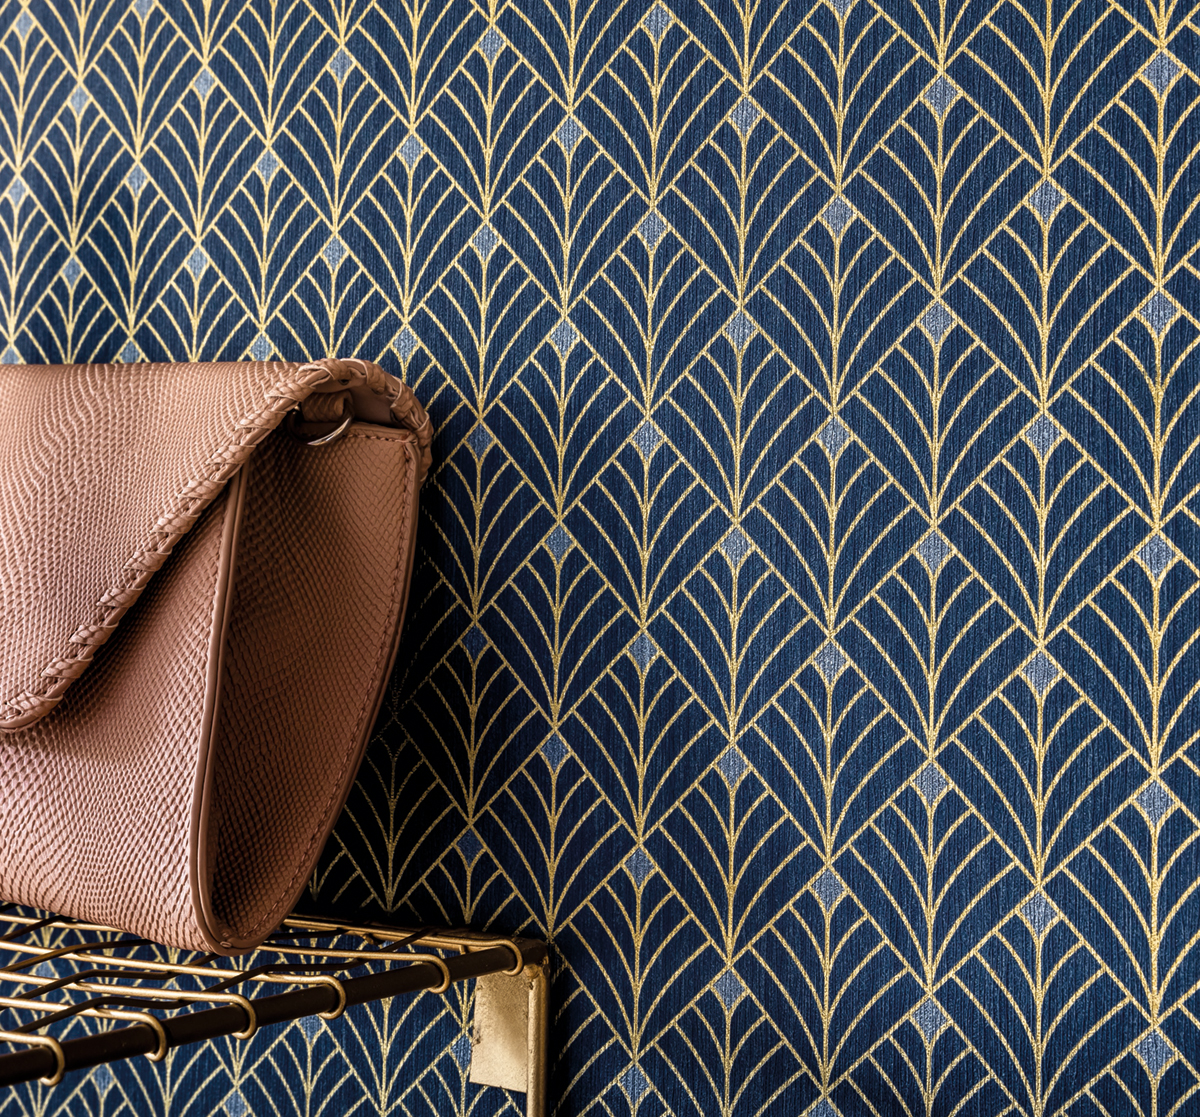 Papier Peint Deco Marine papier peint art déco mistinguett bleu marine/or - scarlett